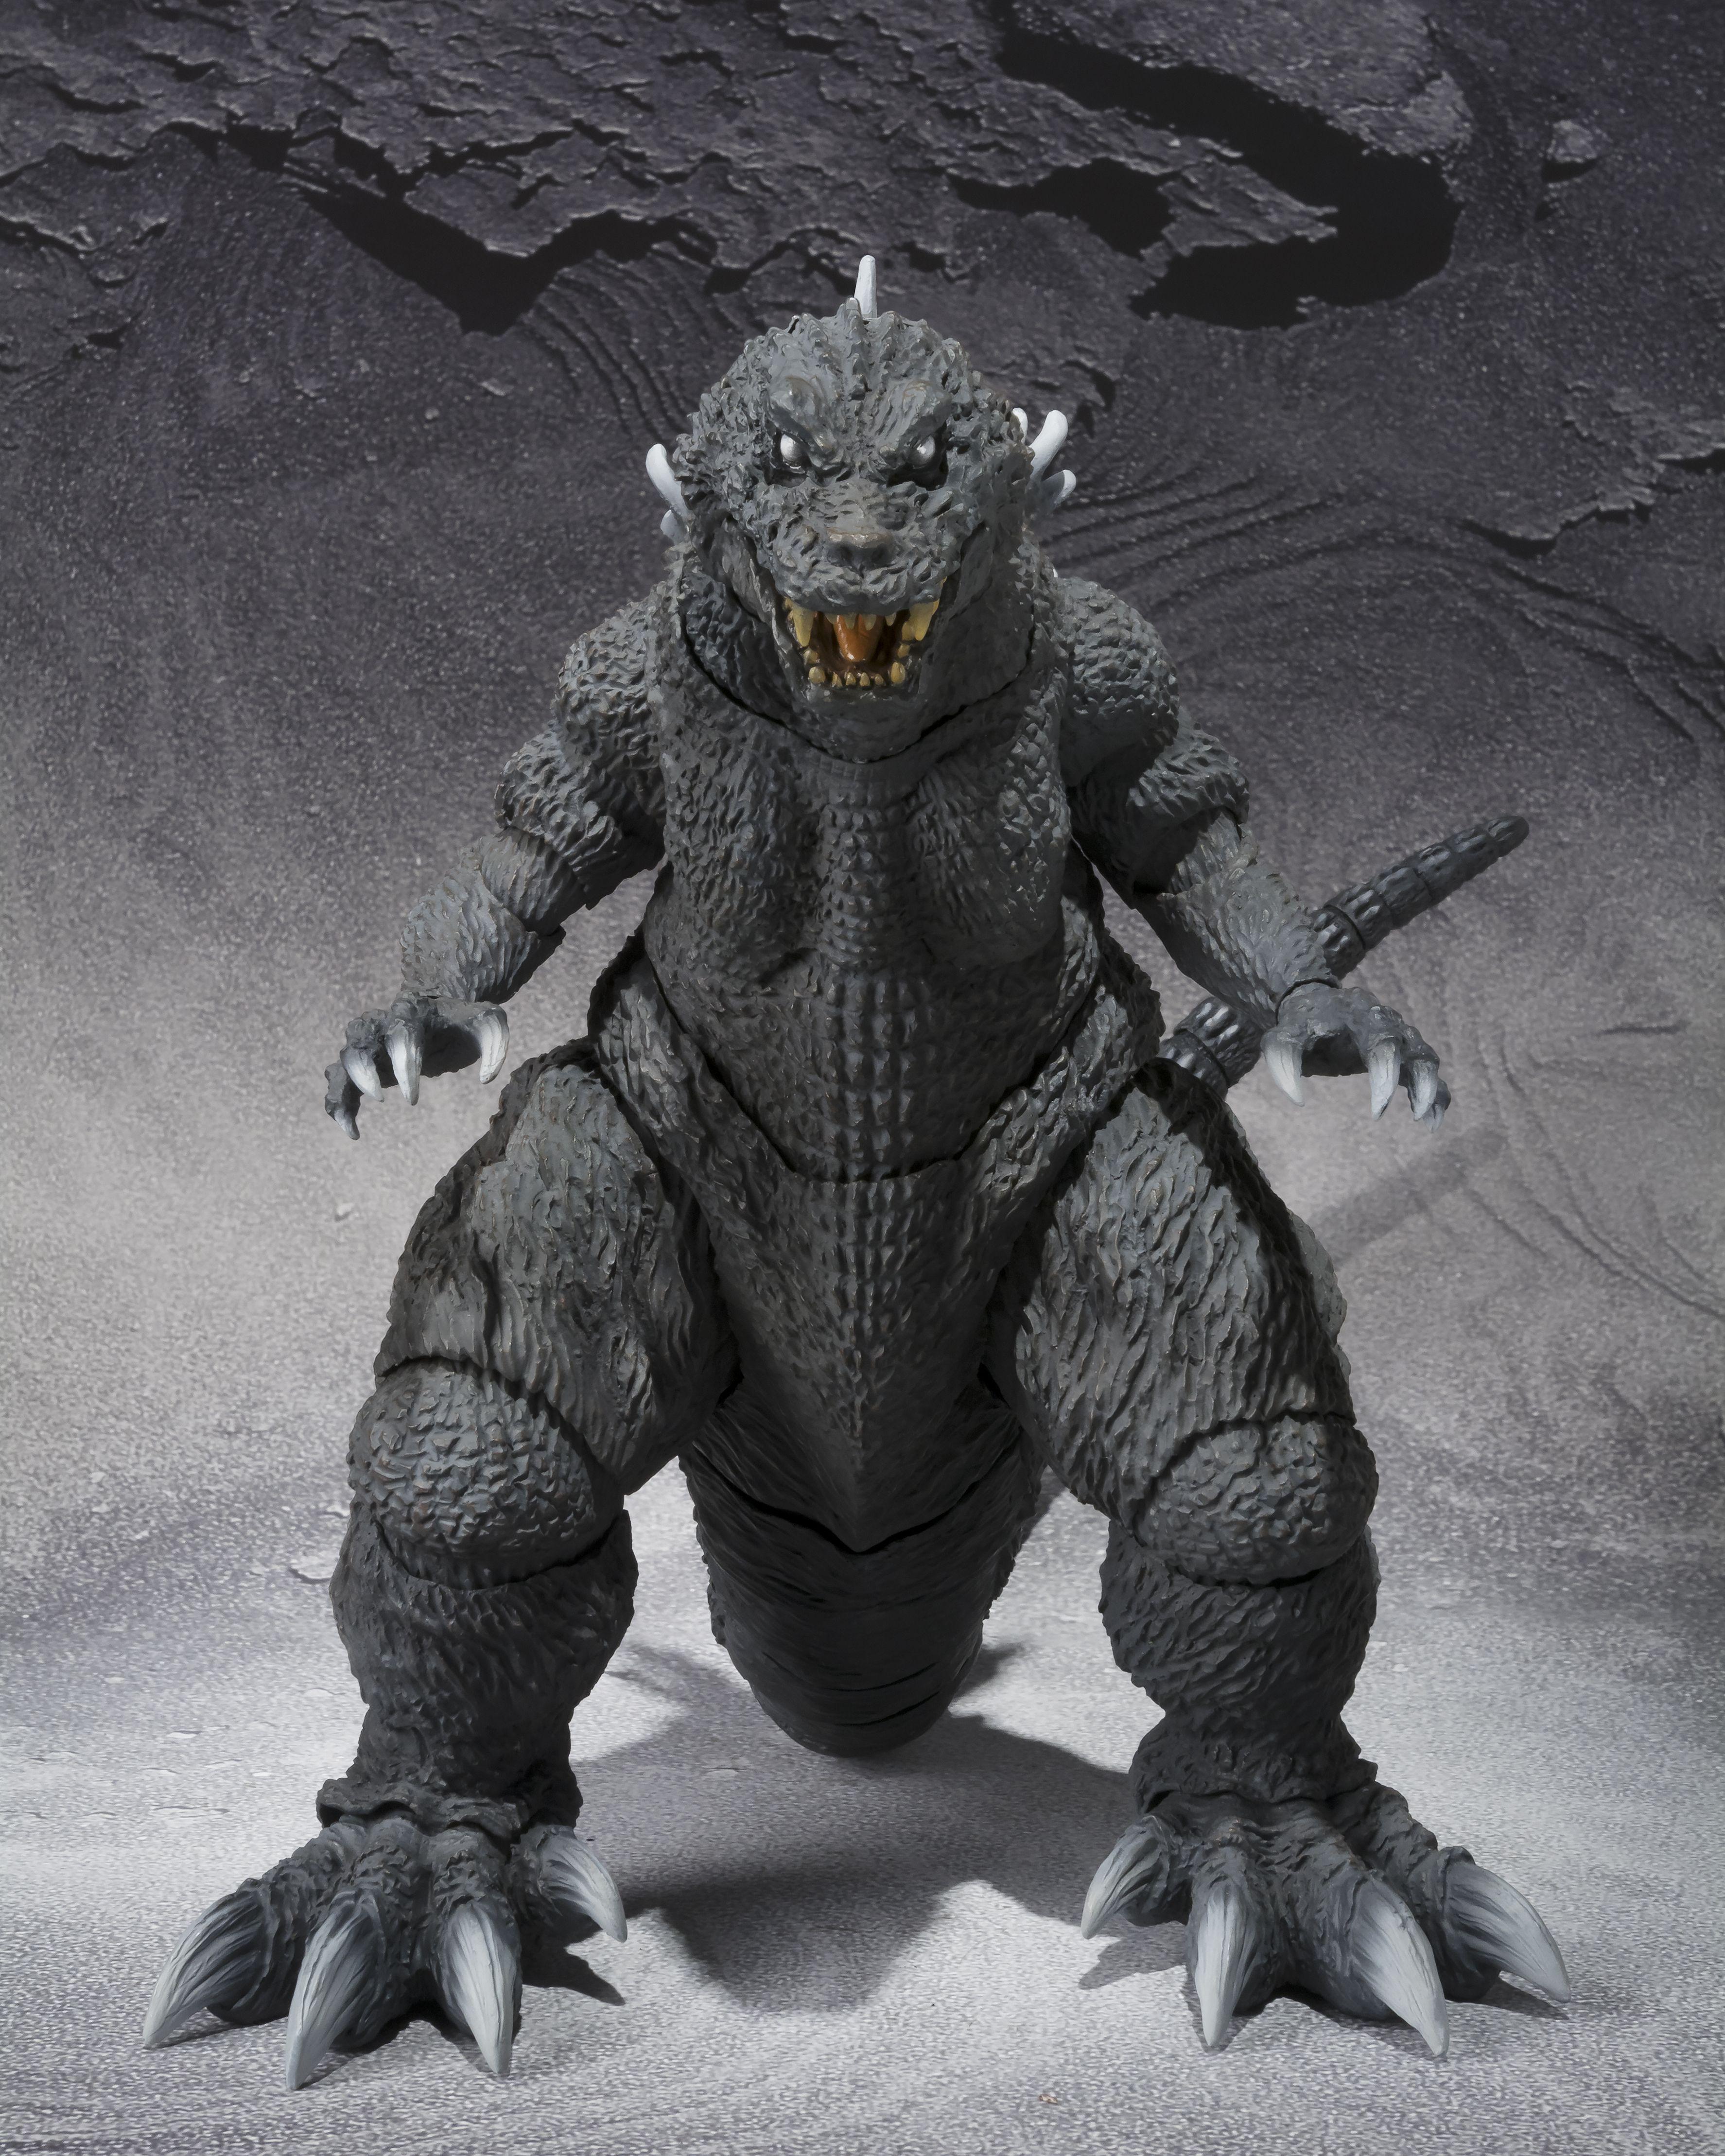 Juguetes De Godzilla Figuras De Accion Figuras De Anime [ 4436 x 3549 Pixel ]